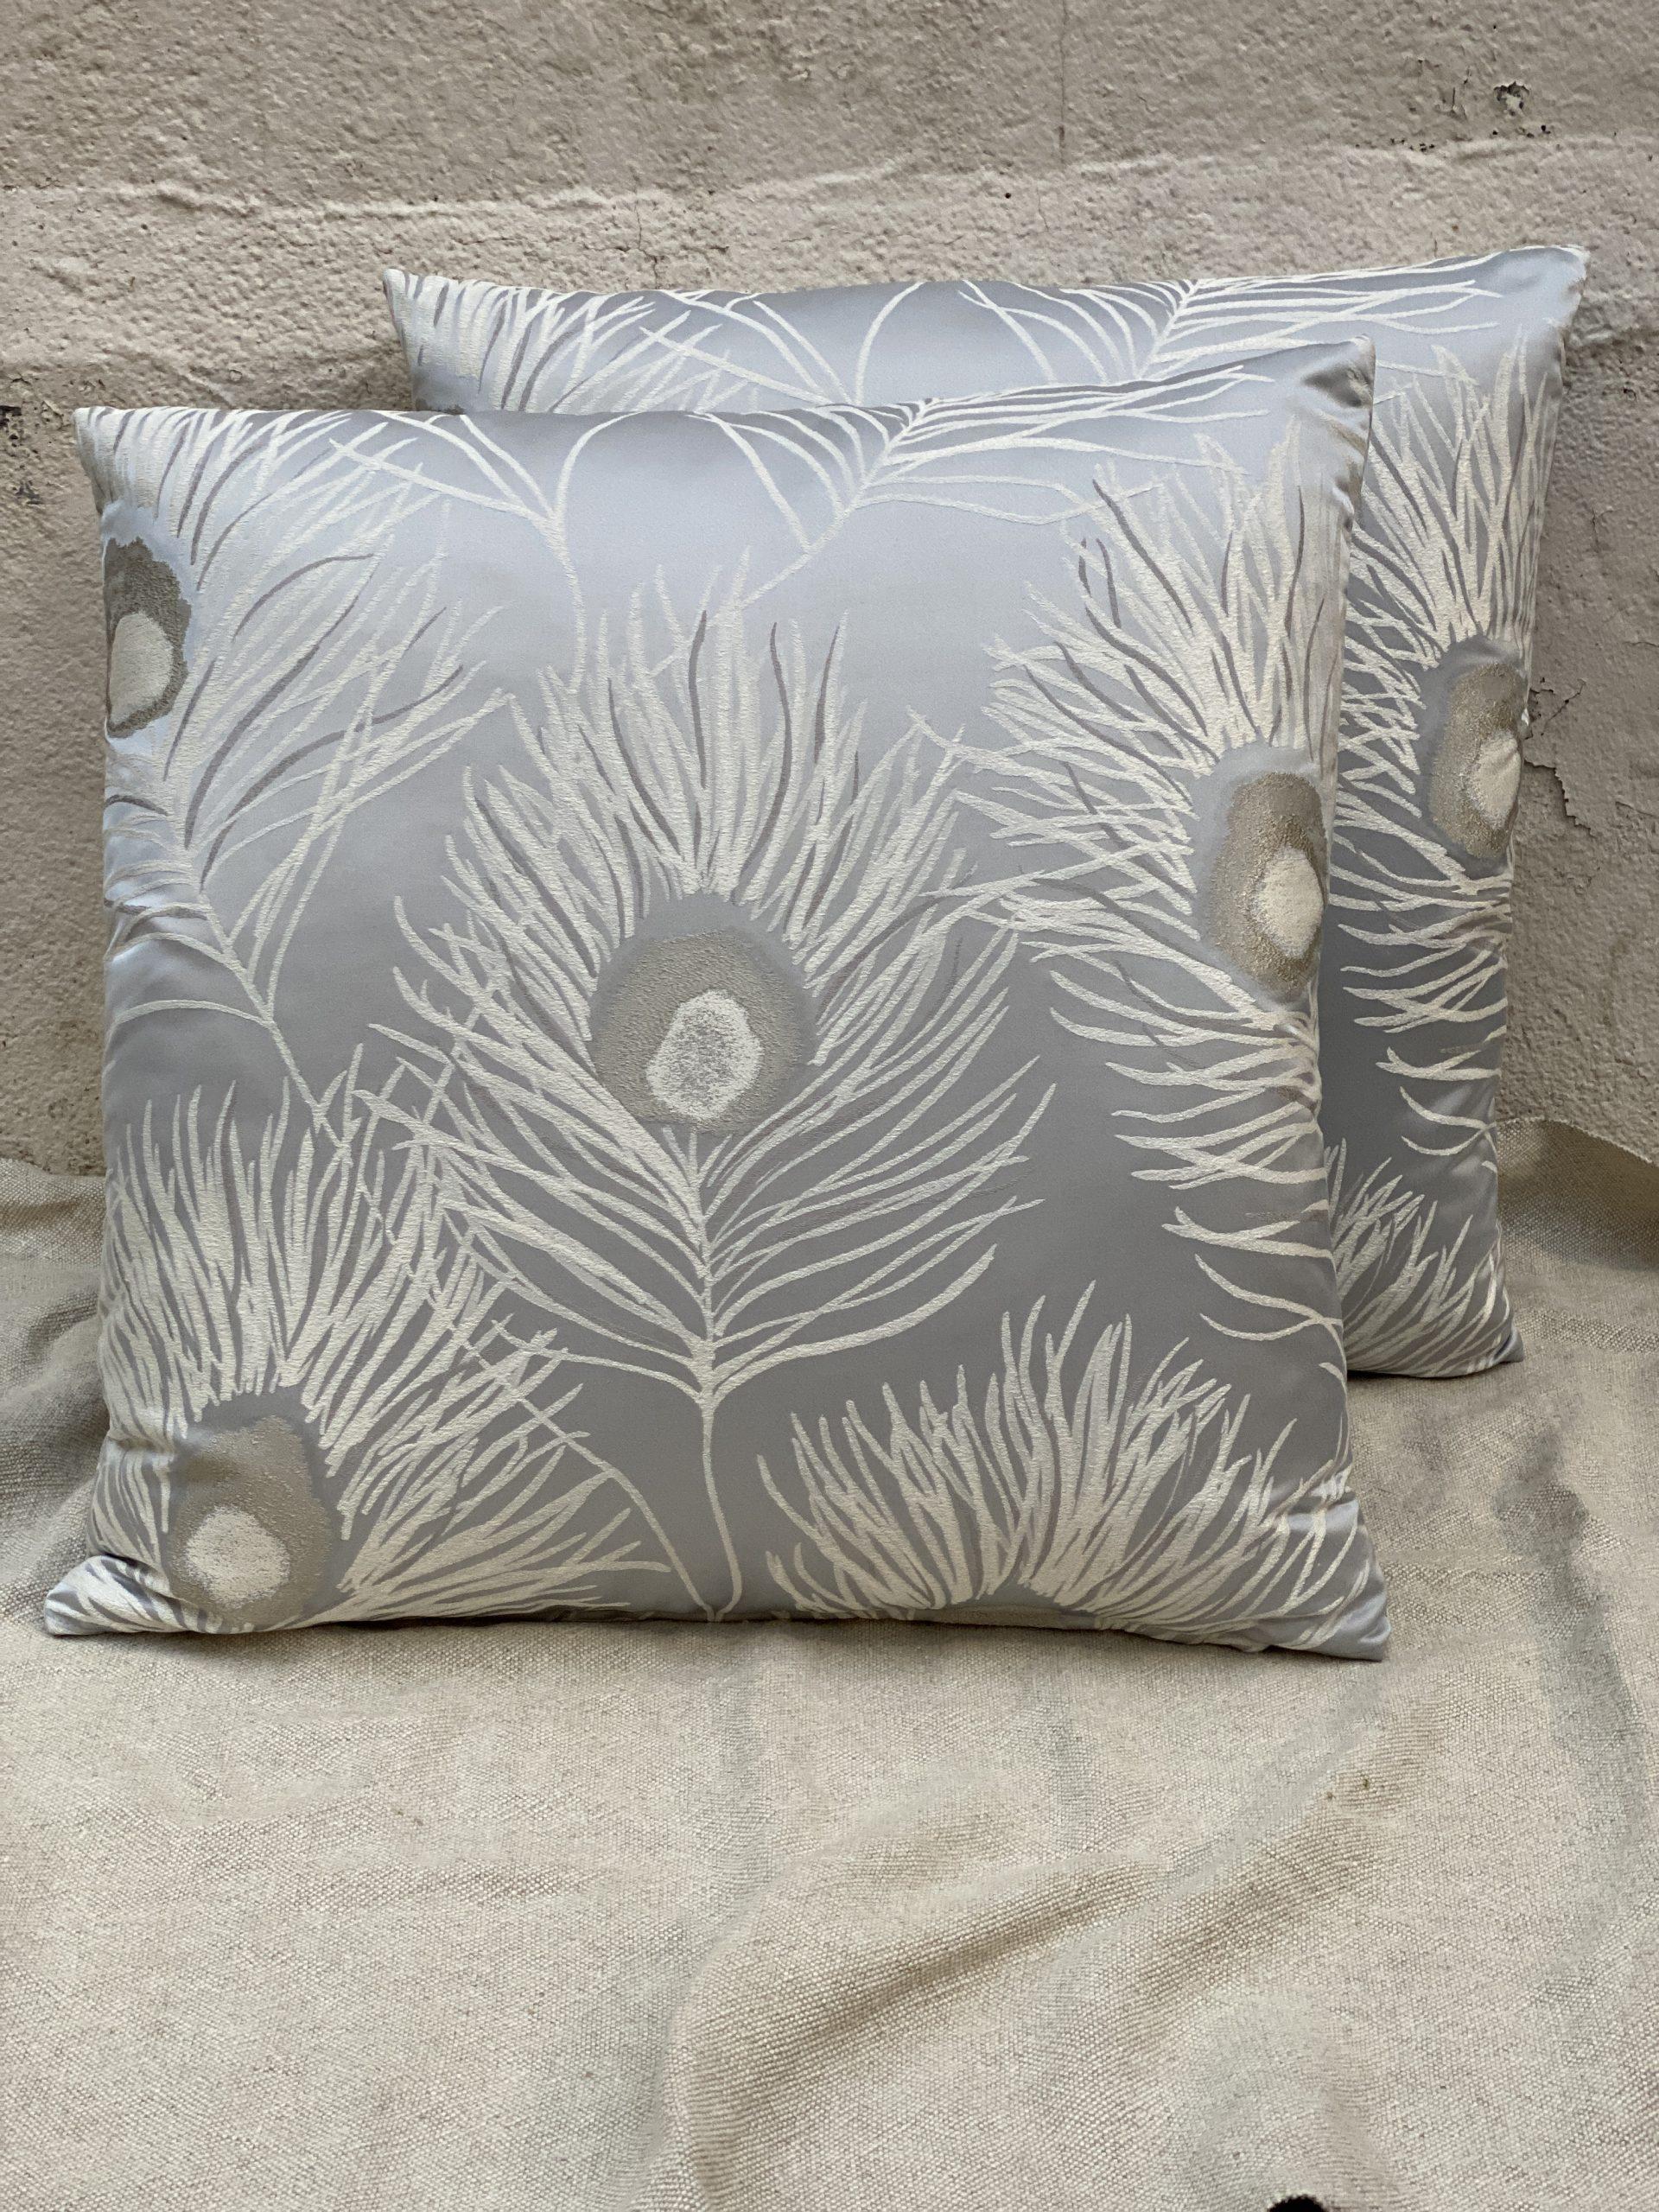 Harlequin Pillows